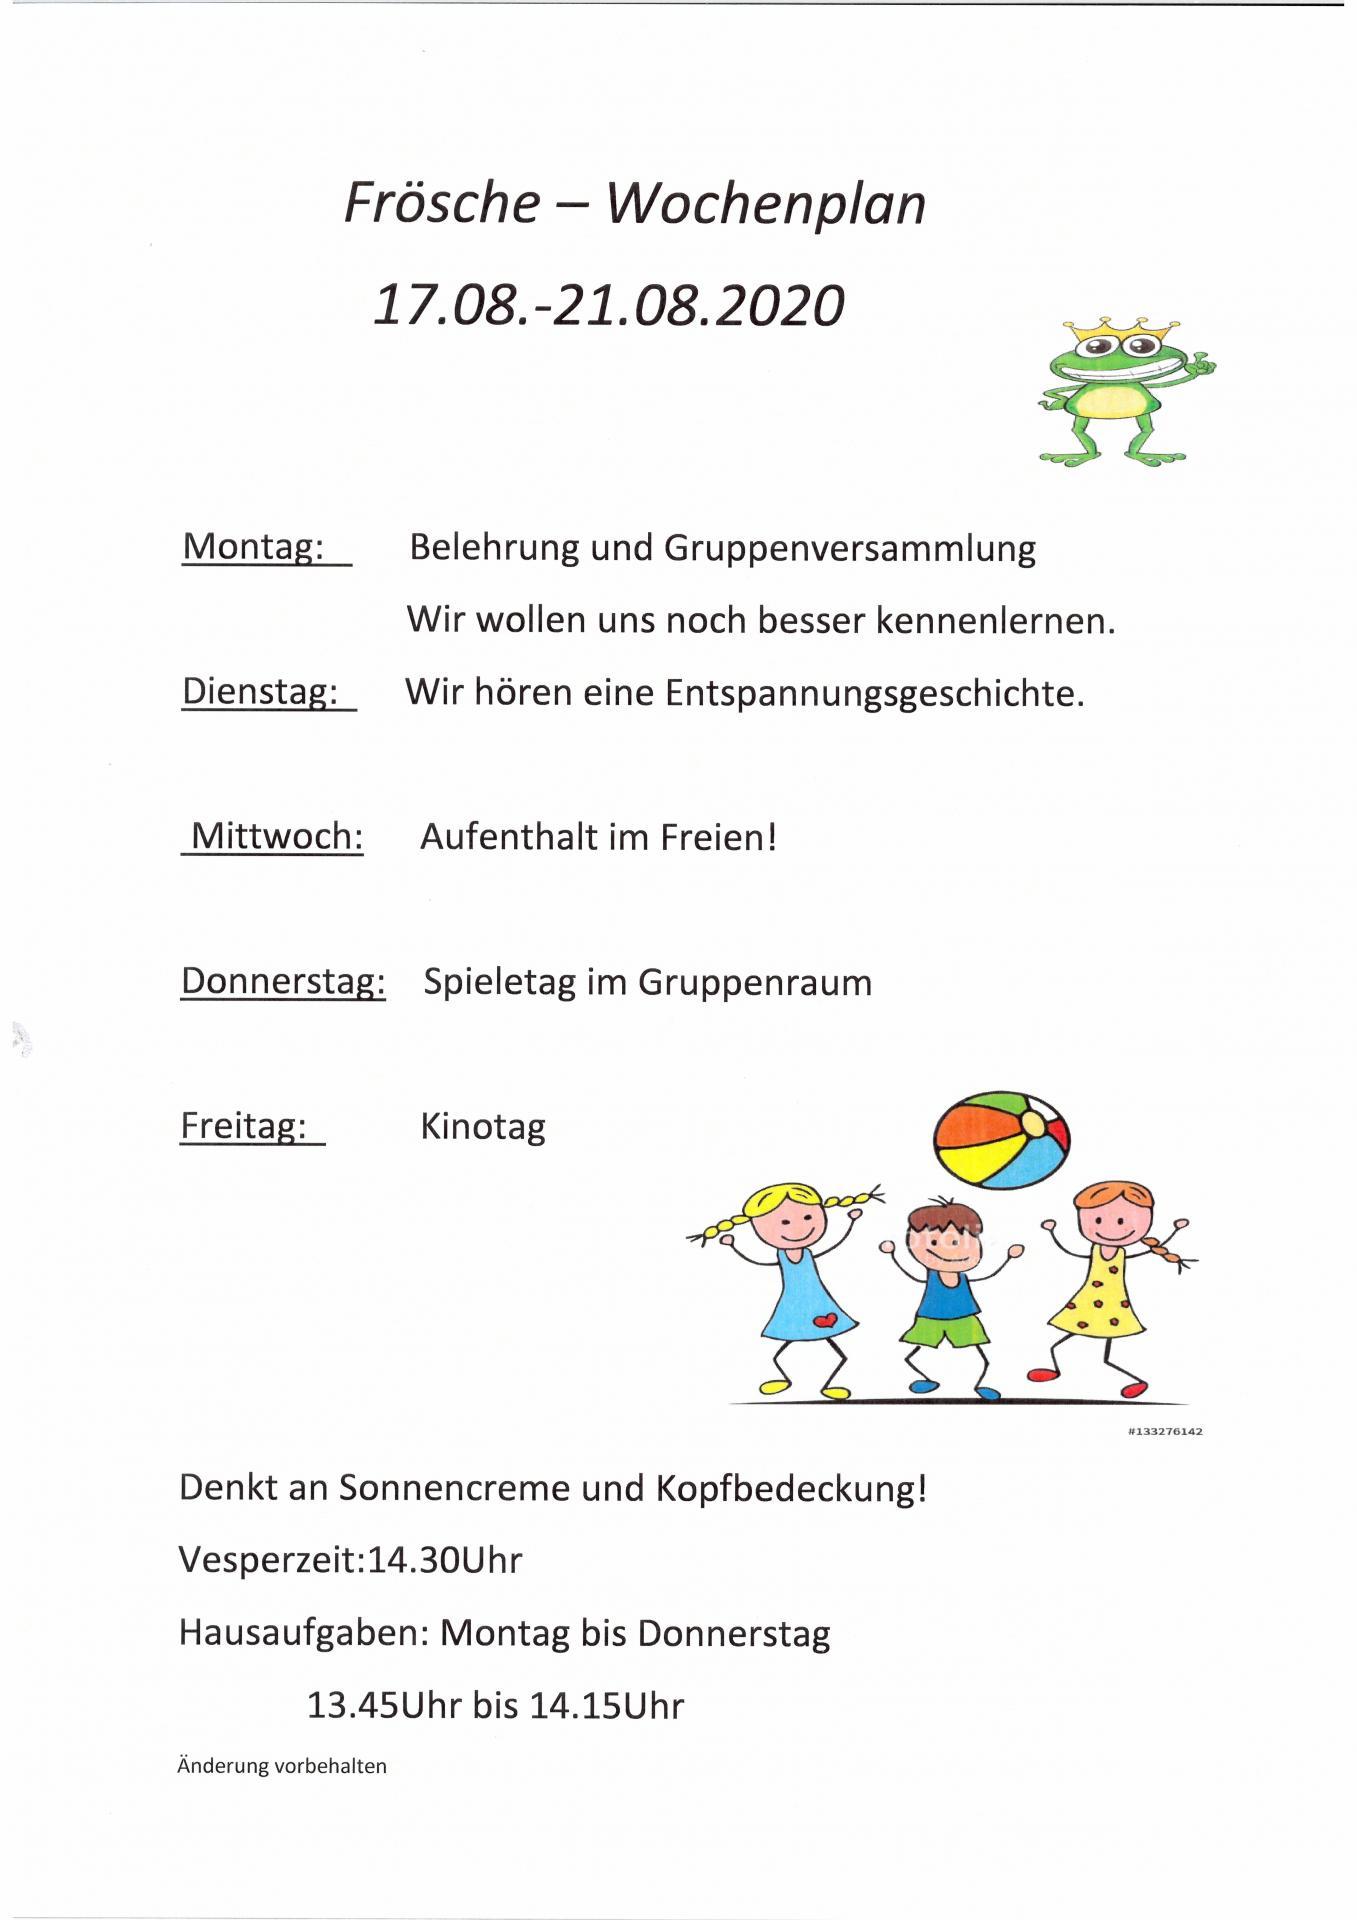 WP Frösche 17.08 - 21.08.